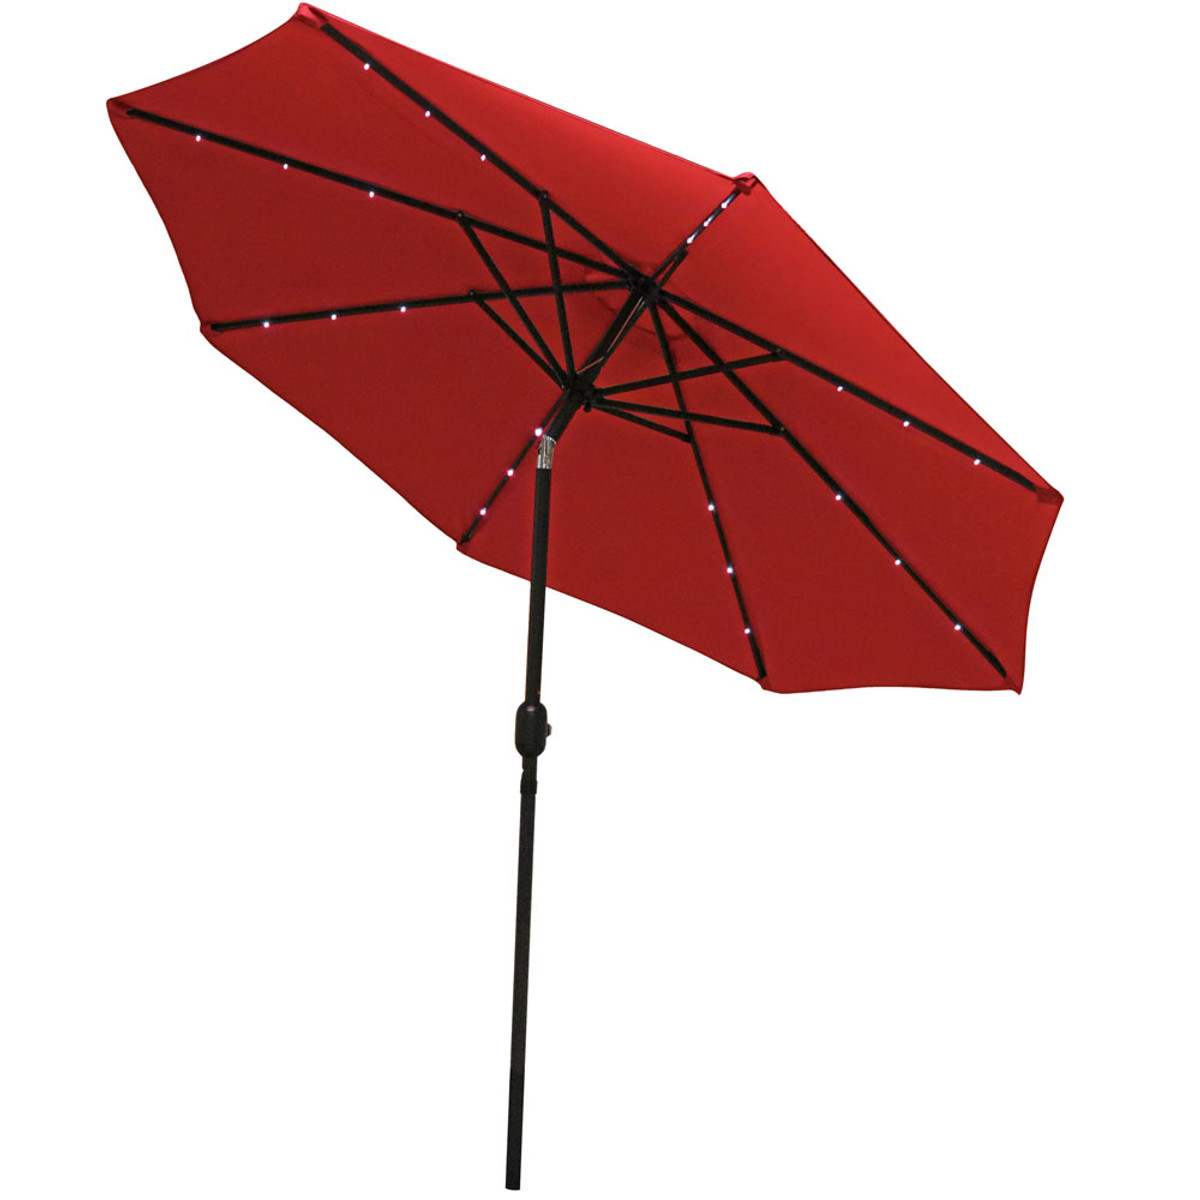 sunnydaze solar powered led lighted patio umbrella with tilt crank 9 foot